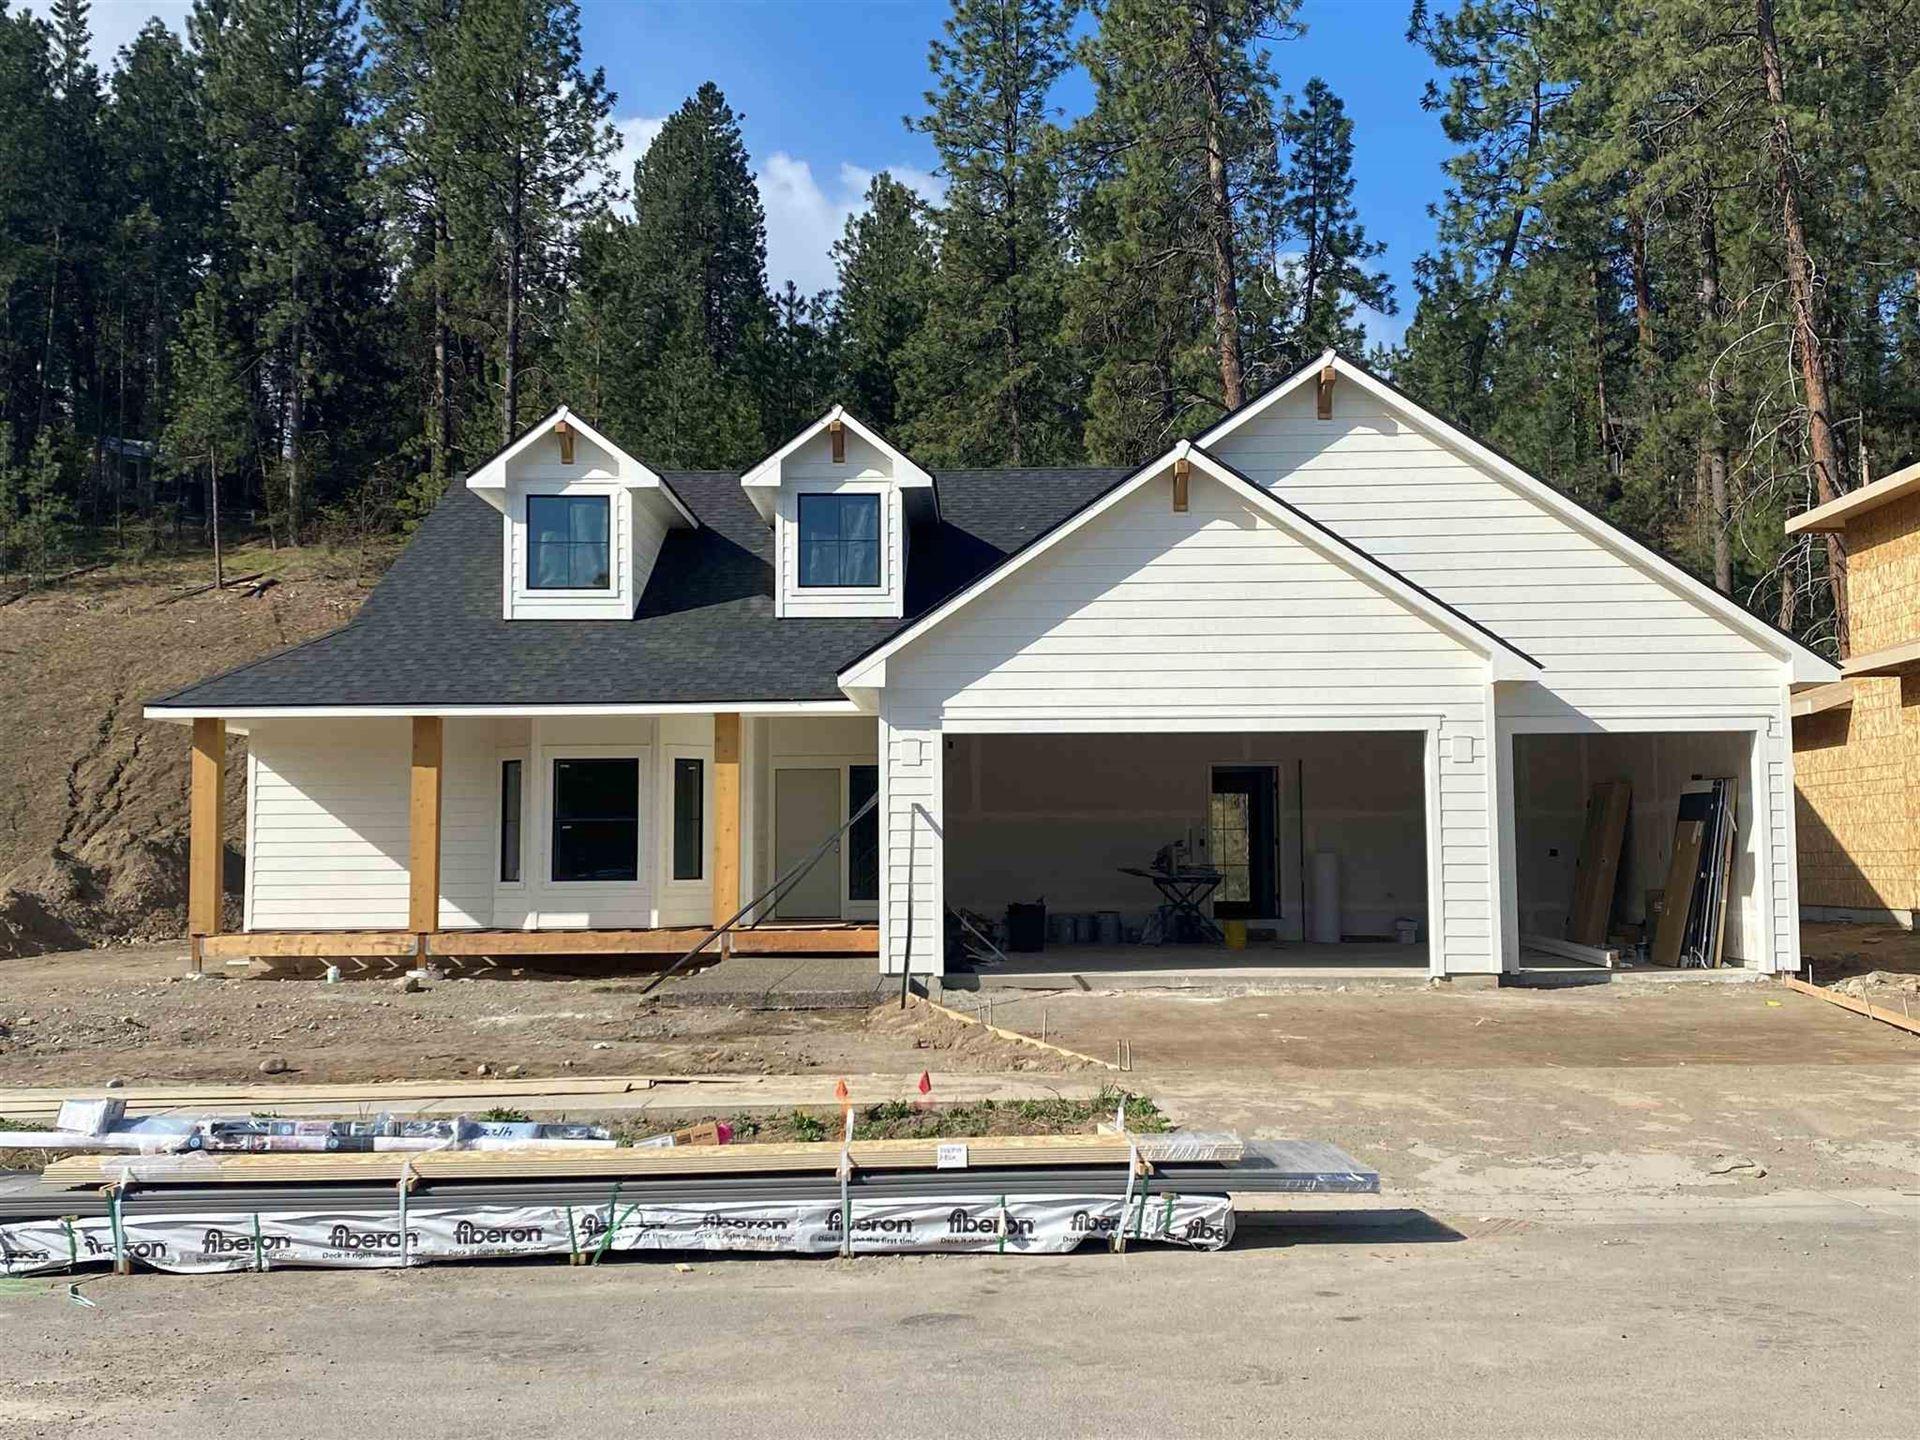 4106 S Sundown Dr, Spokane Valley, WA 99206 - #: 202114698